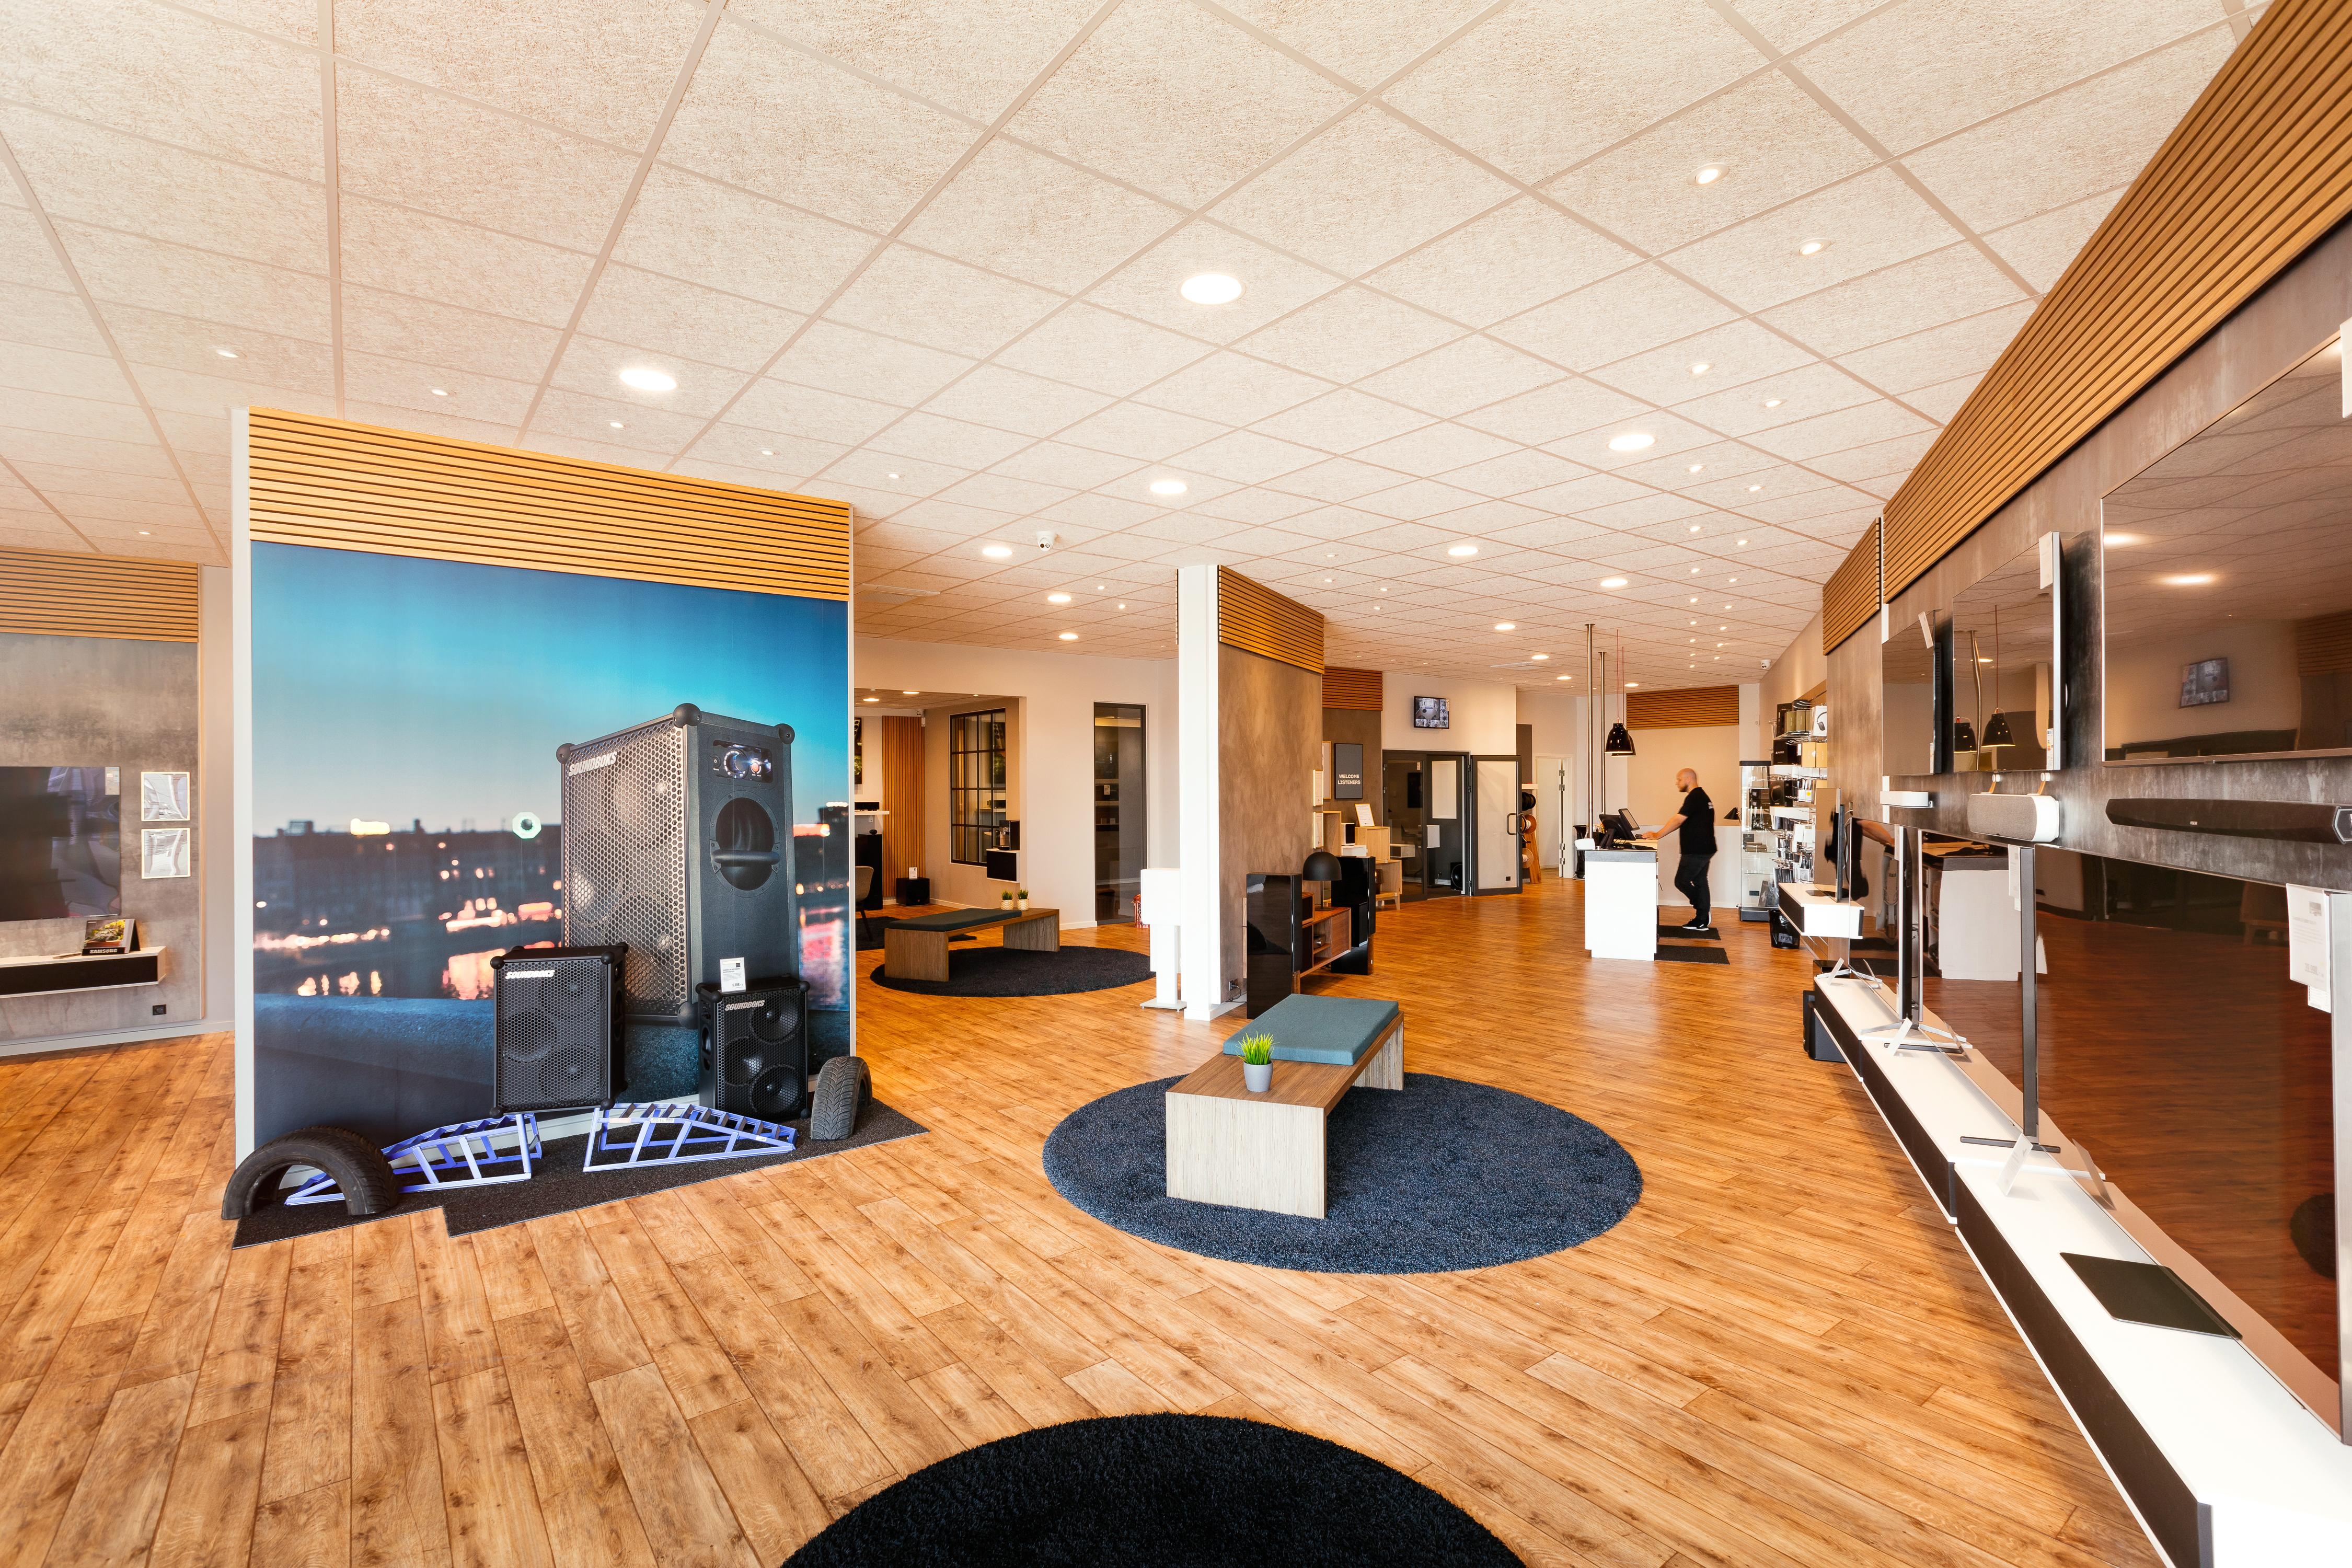 Ny-butik_Aalborg (14).jpg